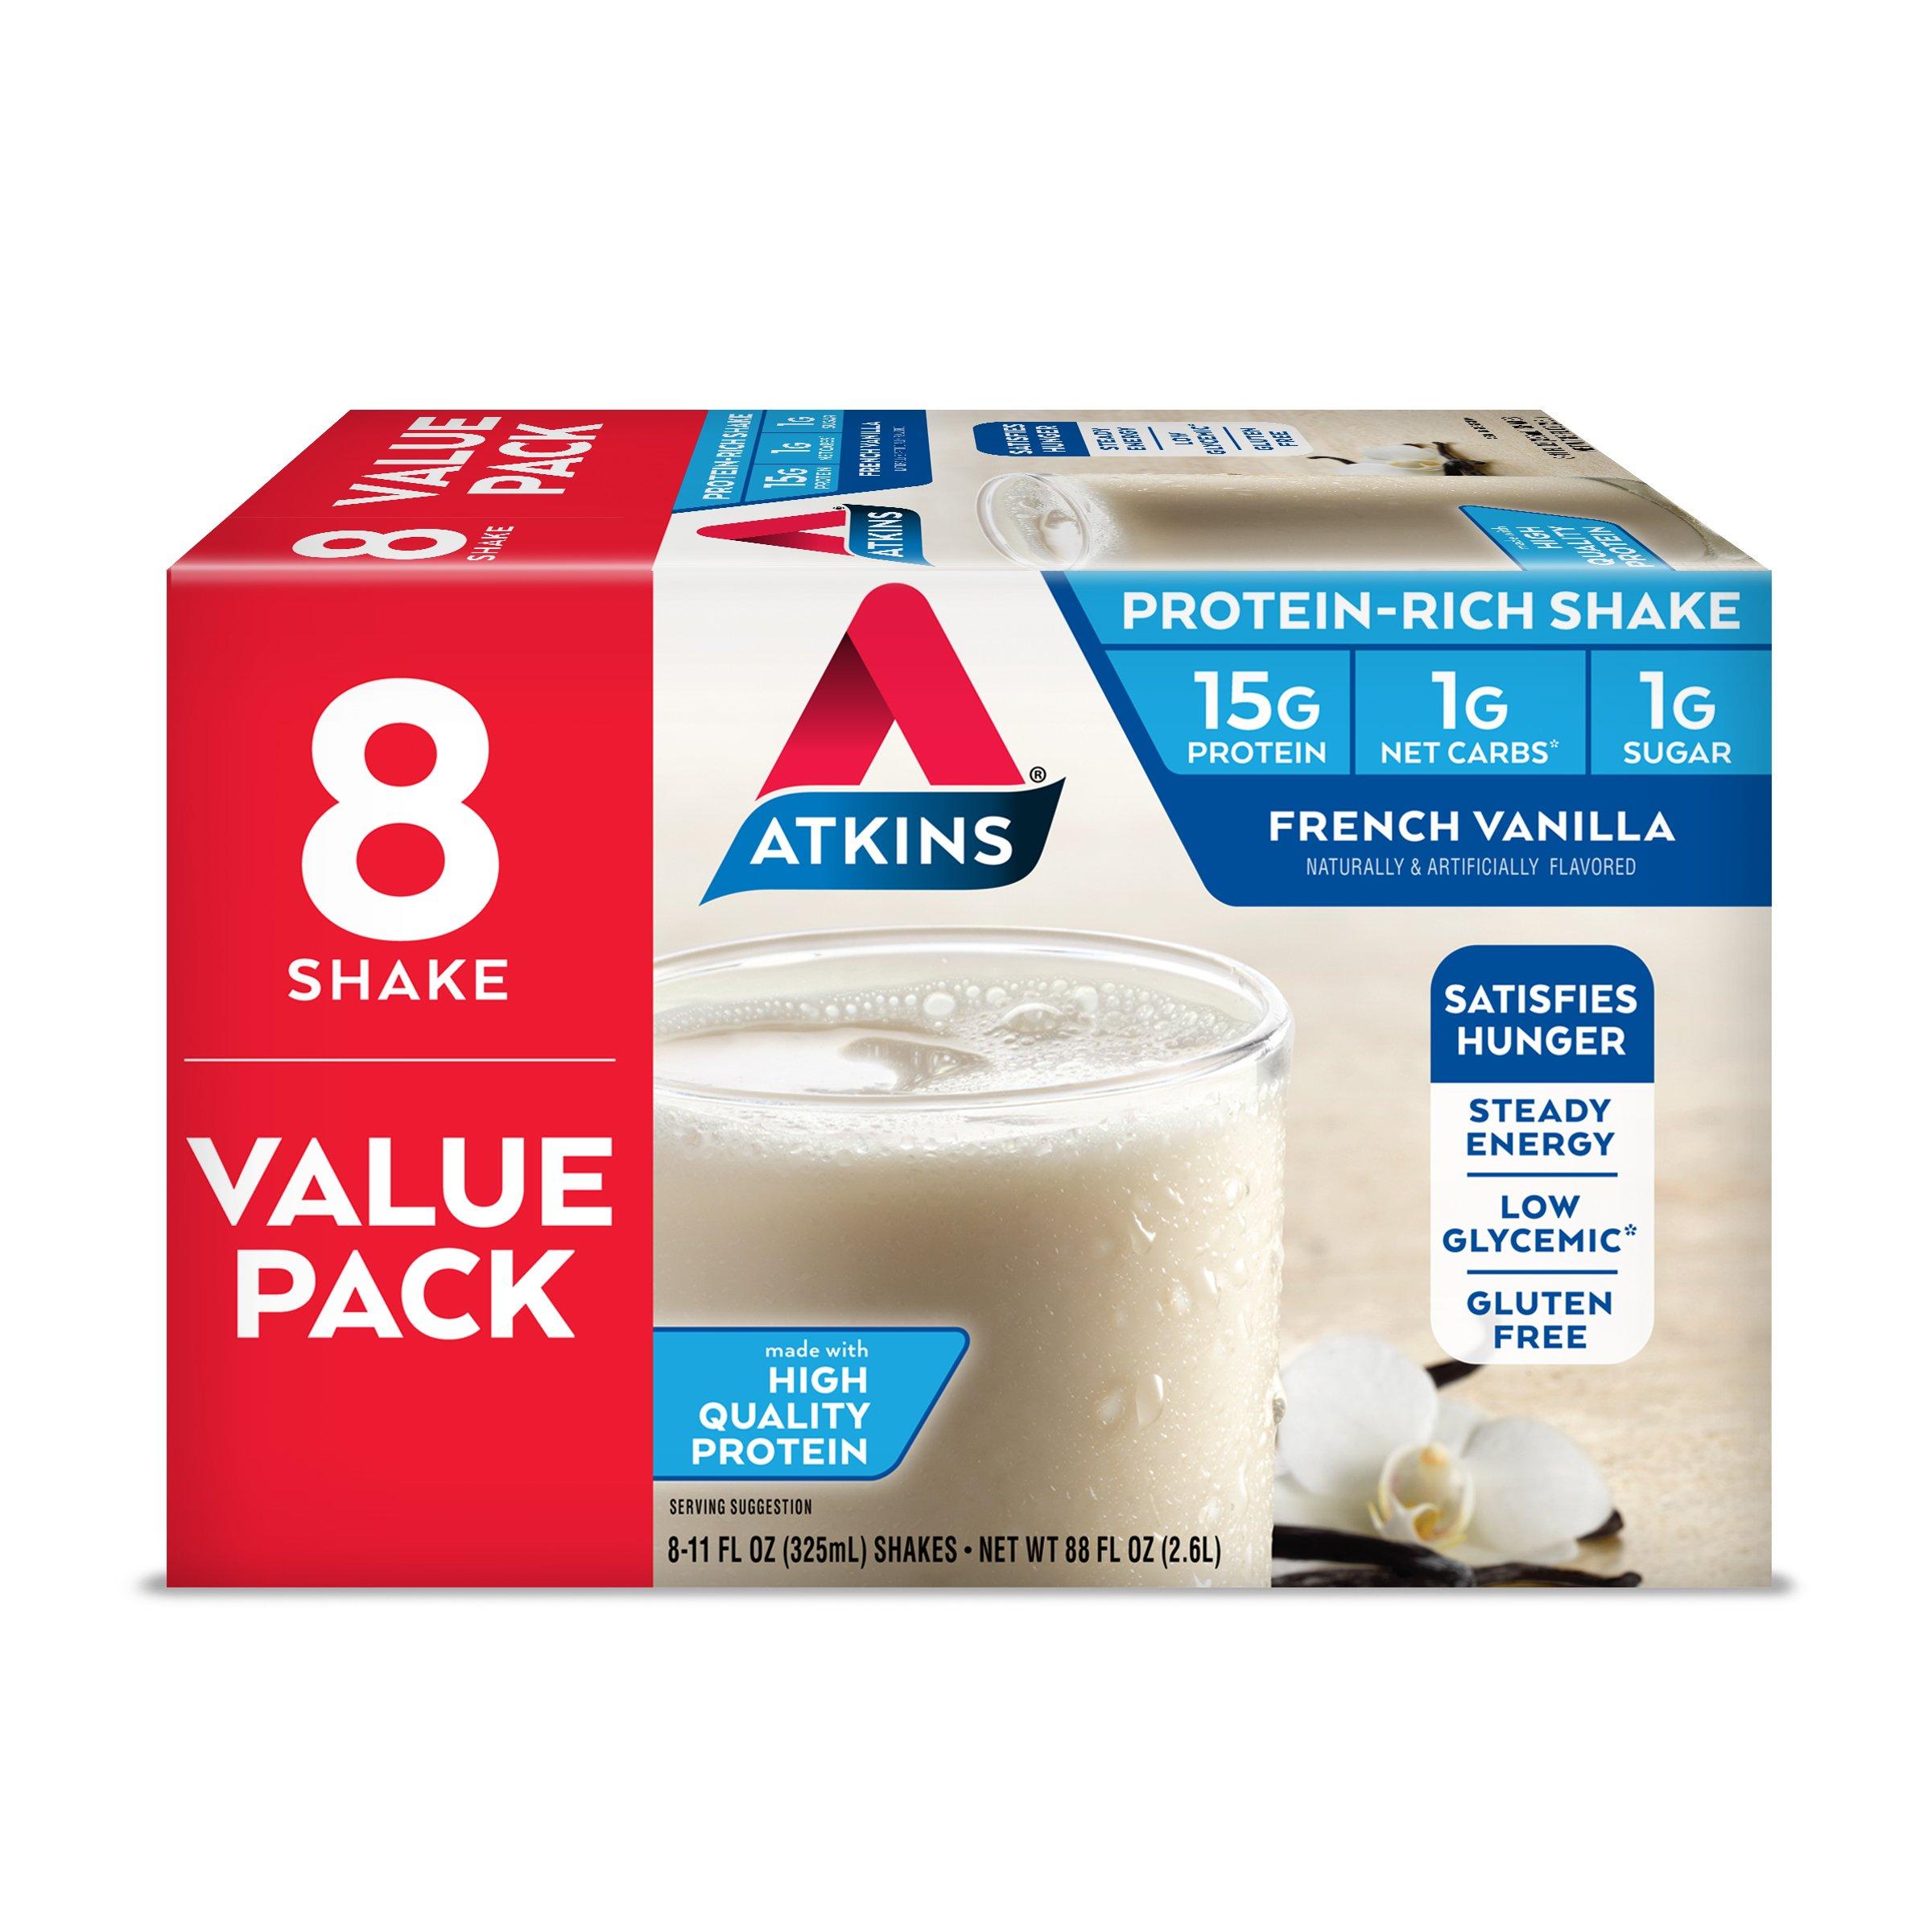 Atkins Gluten Free Protein-Rich Shake, French Vanilla, Keto Friendly, 8 Count by Atkins